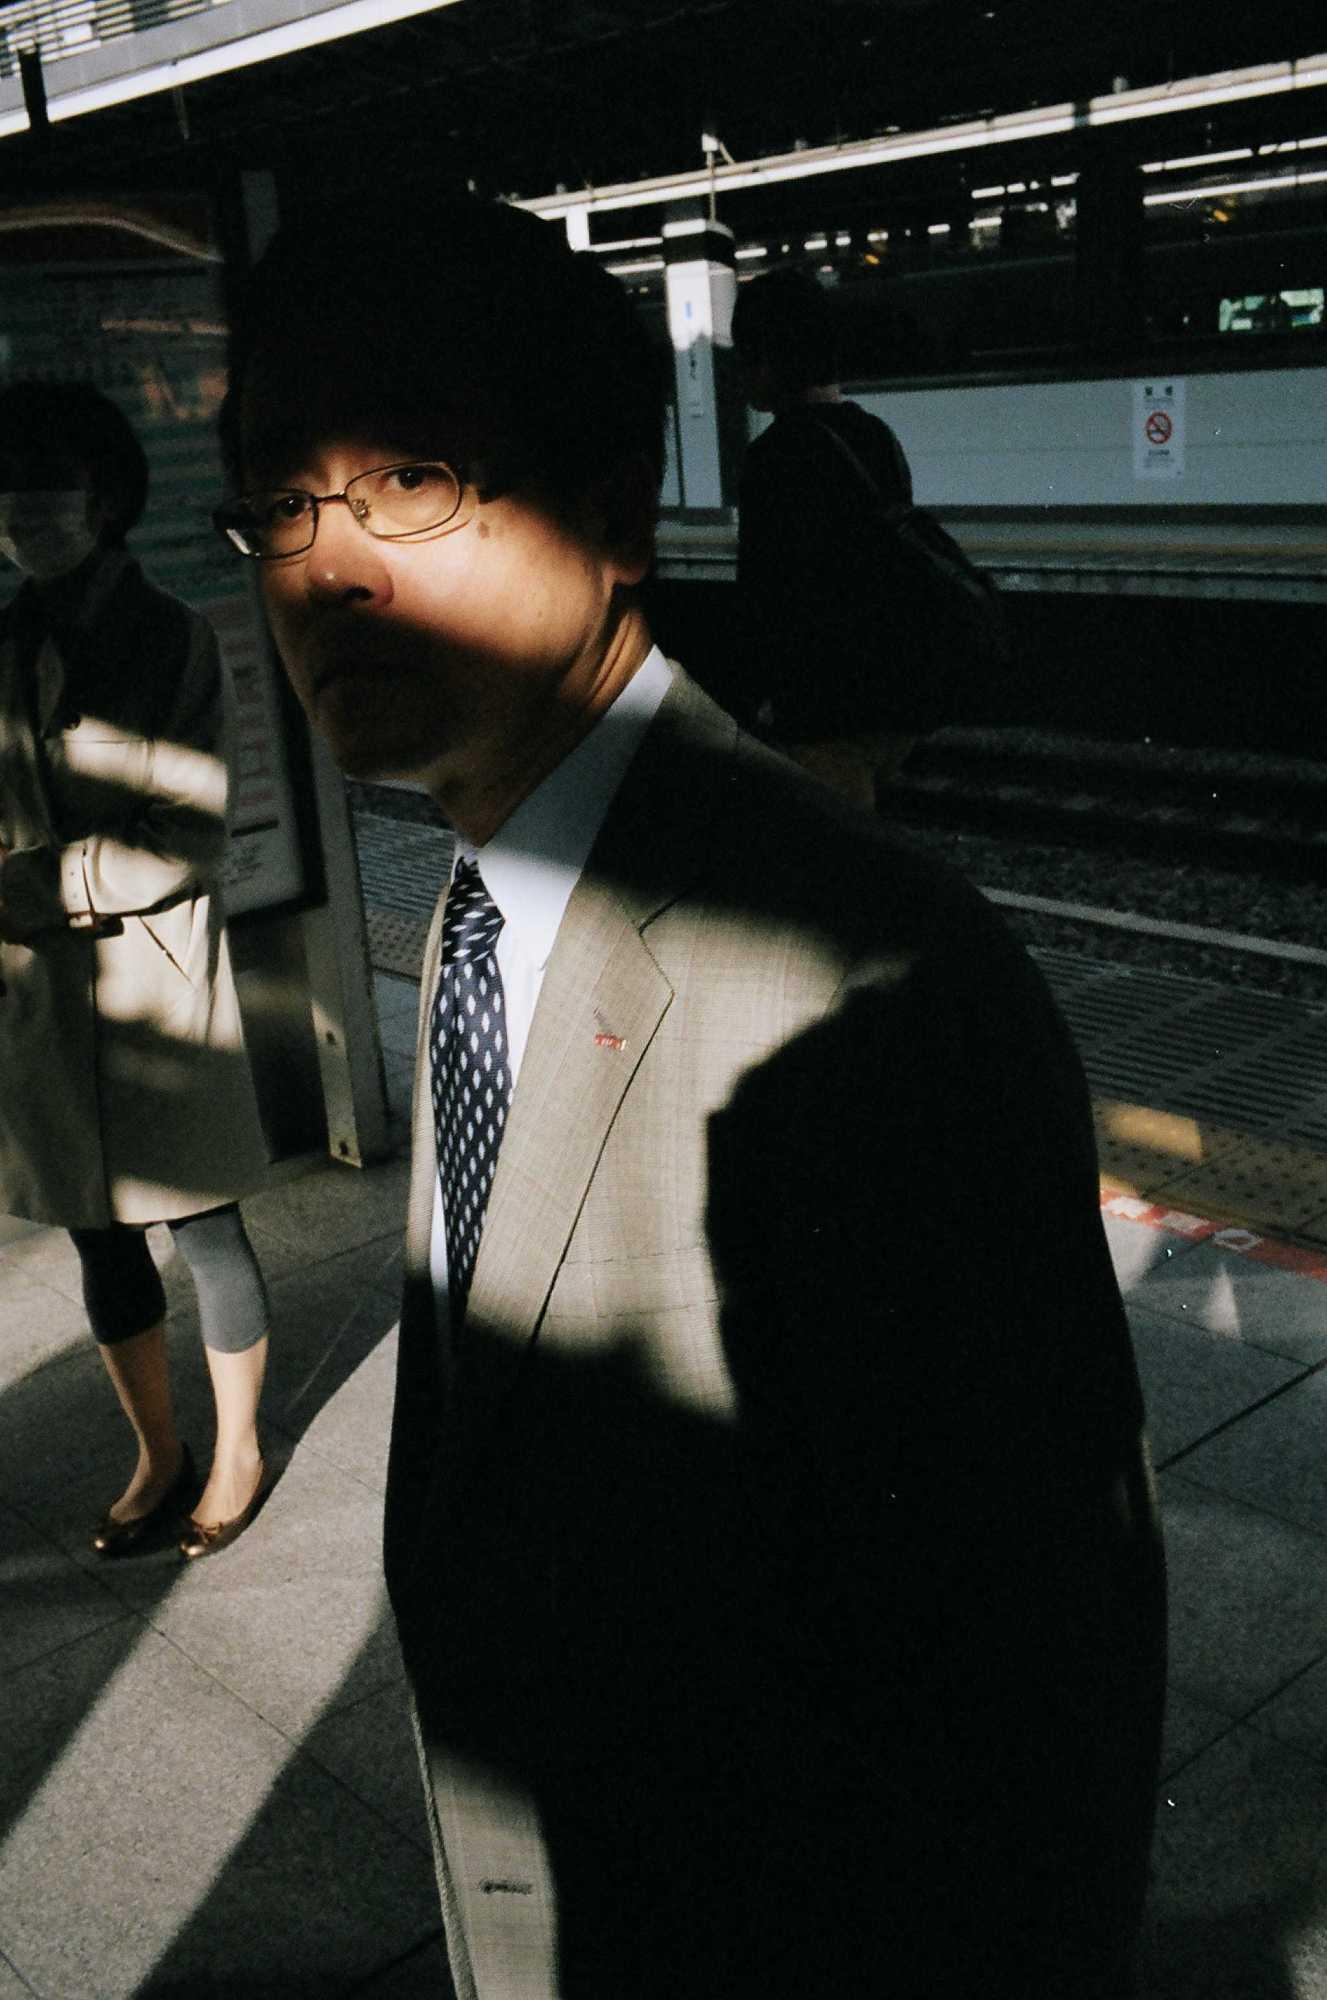 eric-kim-street-photography-suits-project-kodak-portra-400-film-18